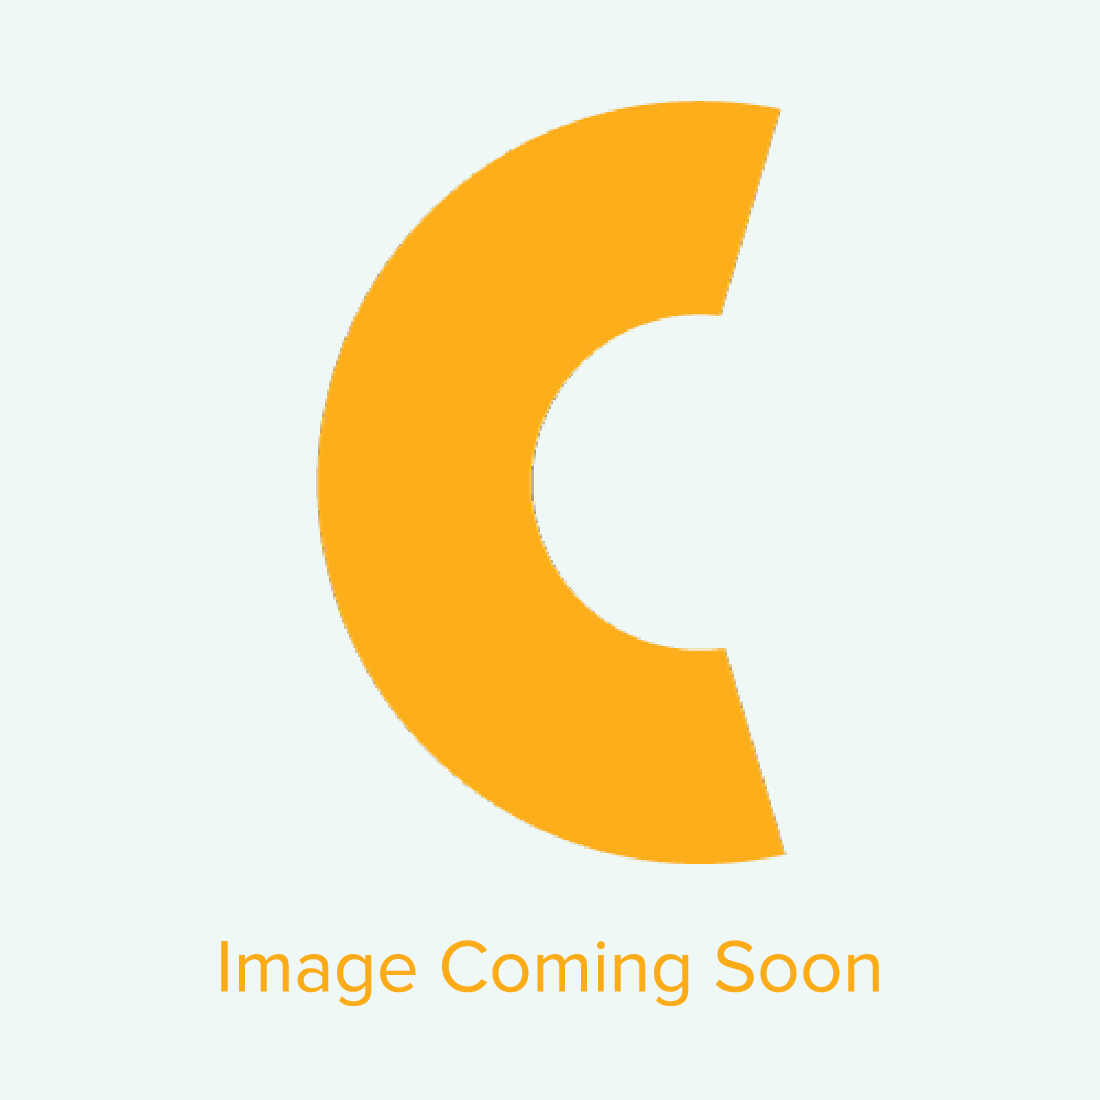 Epson C88 Sublimation Ink - Sawgrass Artainium UV+ 110mL Ink Refill Bags - Yellow - Expired 7/31/18